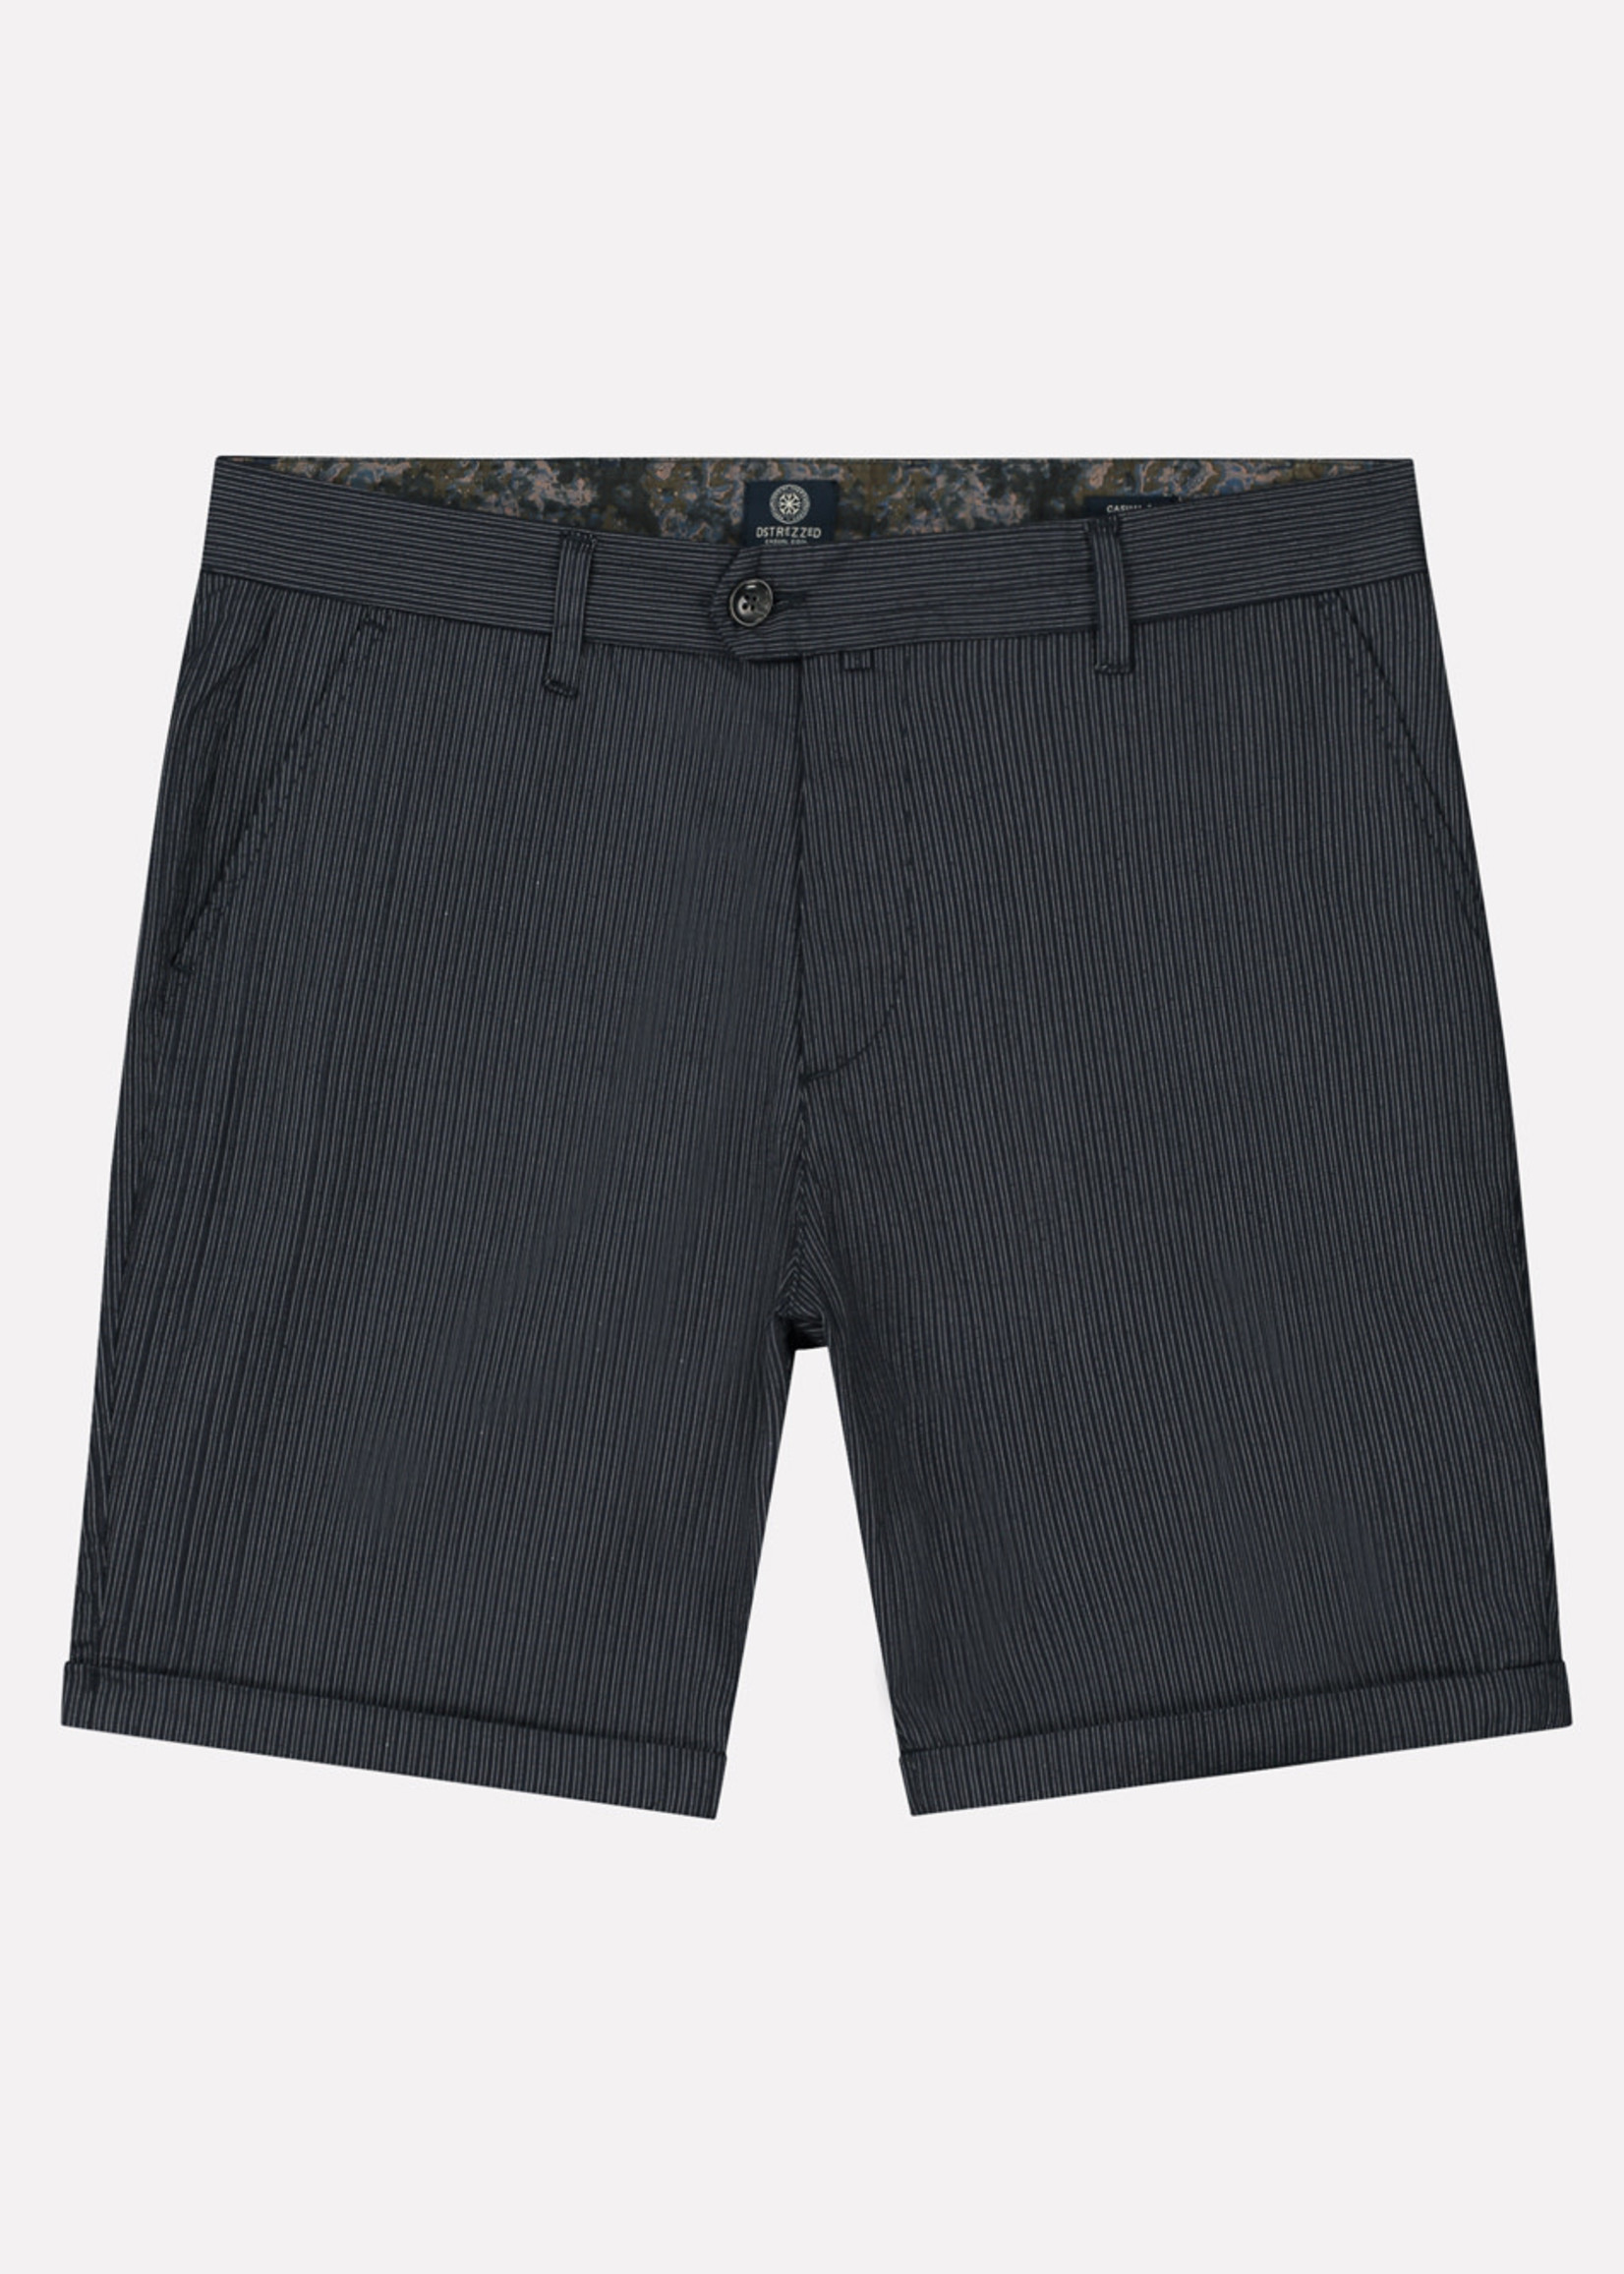 Dstrezzed The Fonda Chino shorts with stripes | Dark Navy | Dstrezzed